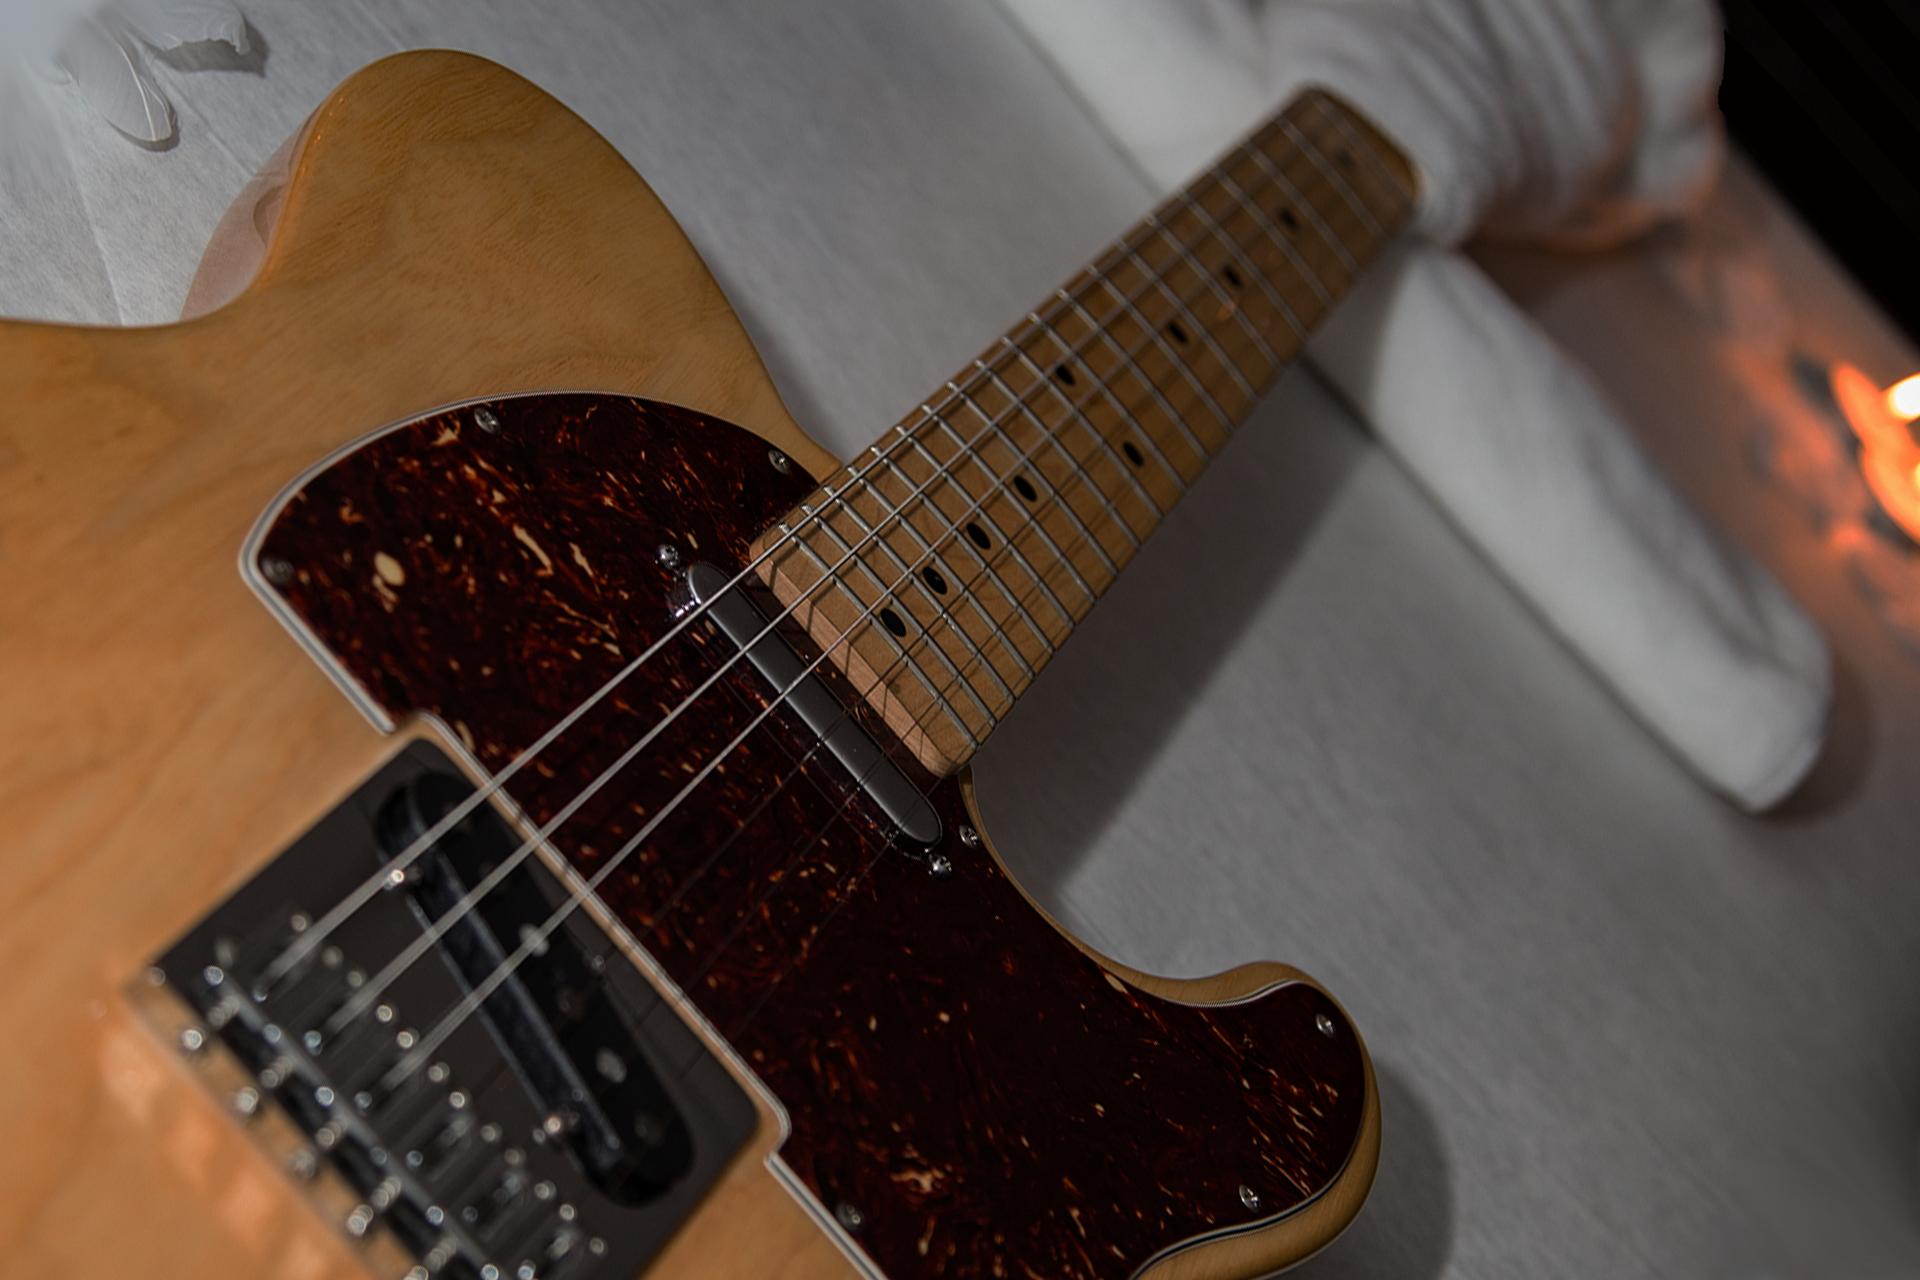 Custom Body Works The Guitar Spa